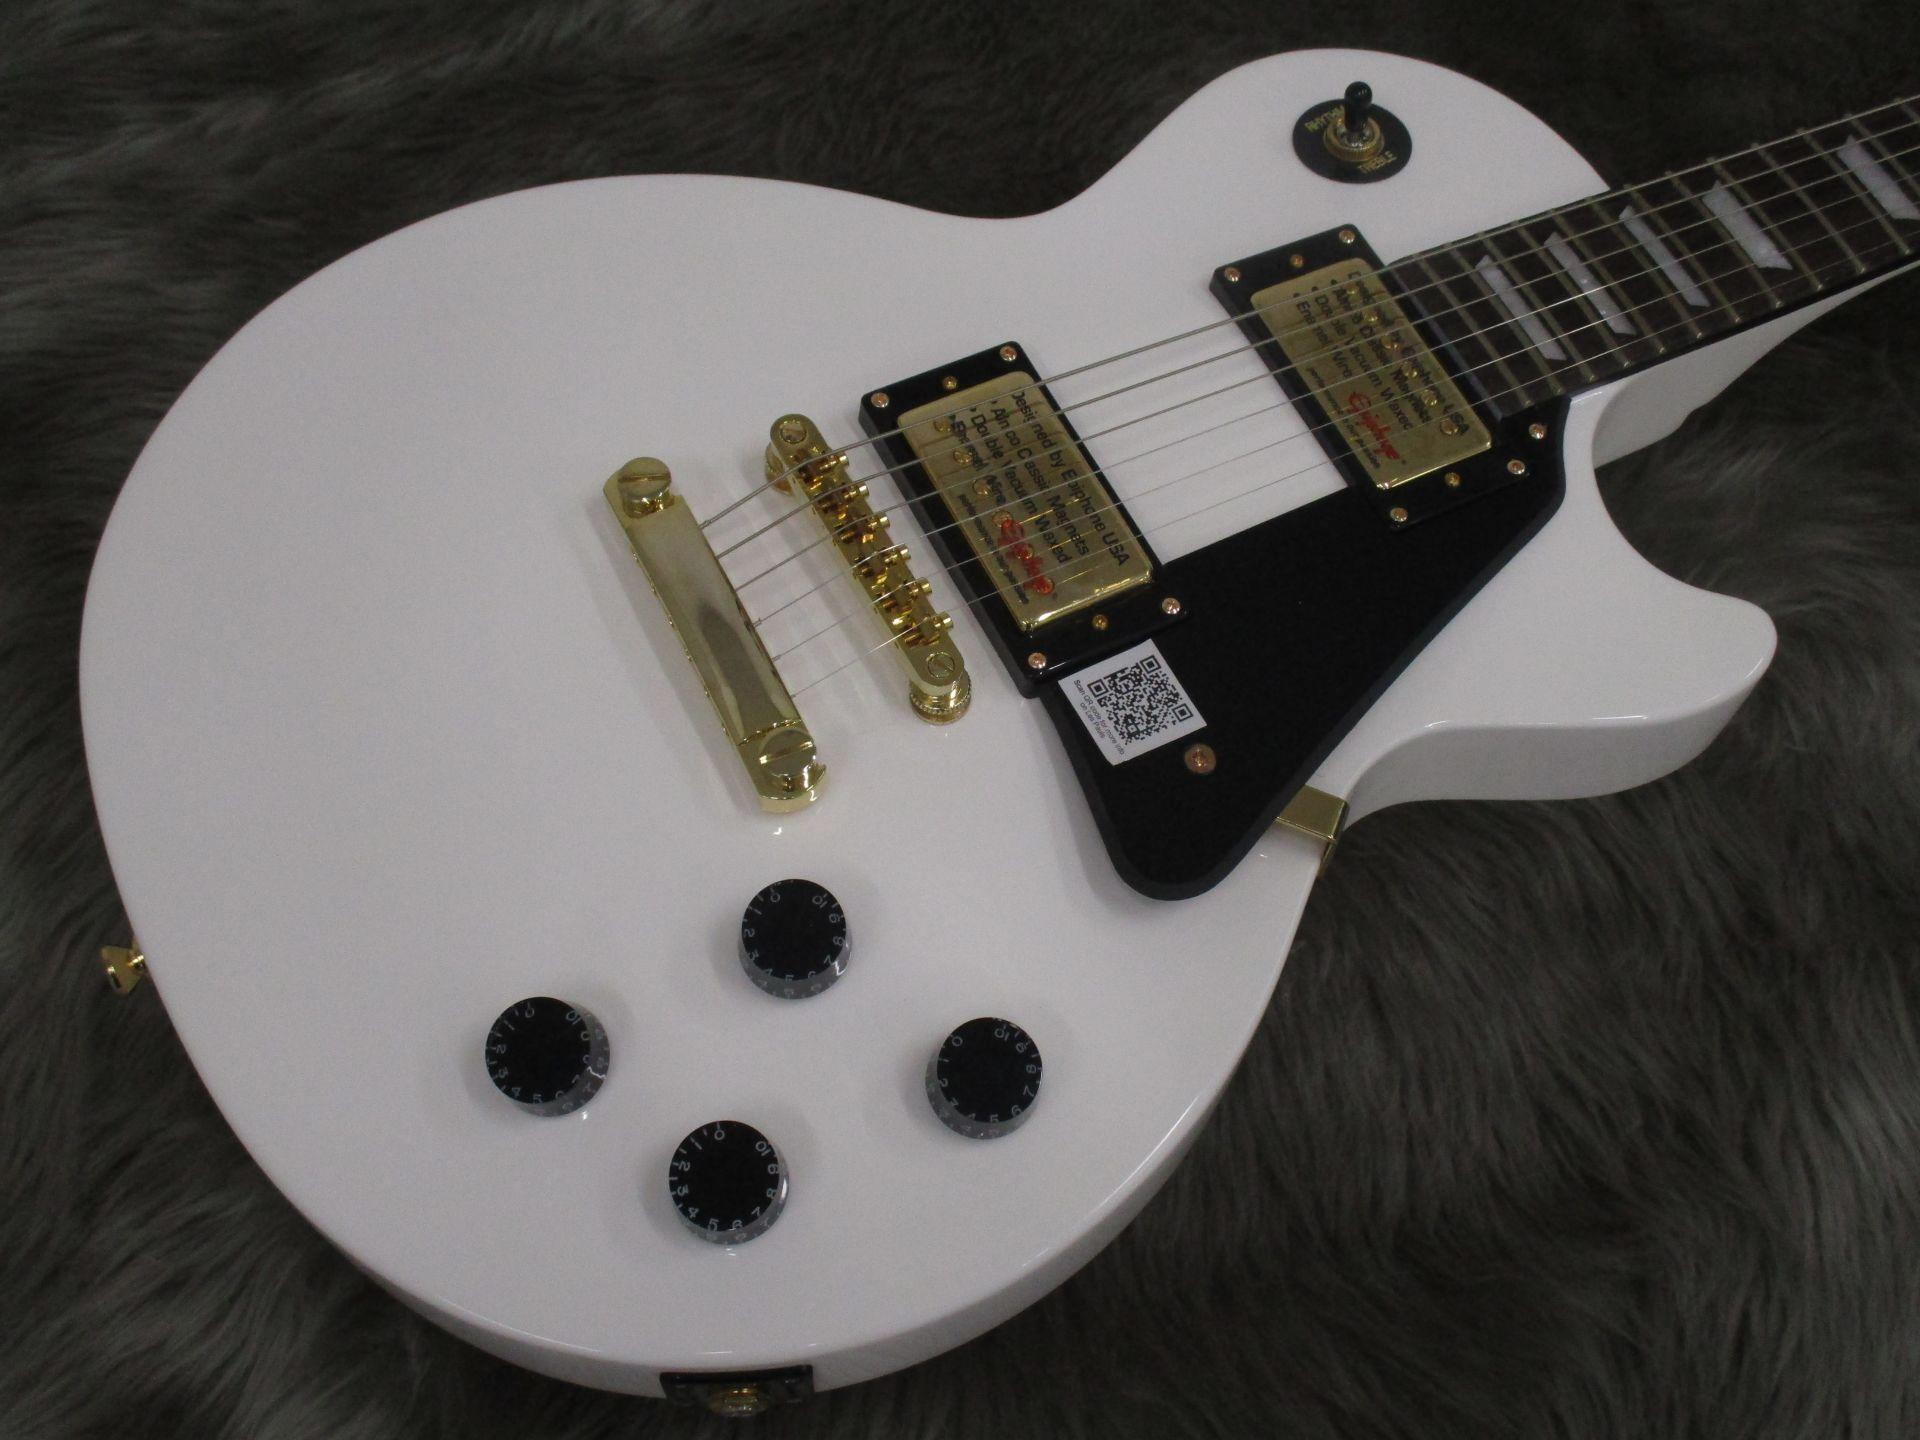 Limited Les Paul Studio Deluxe Alpine Whiteのボディトップ-アップ画像